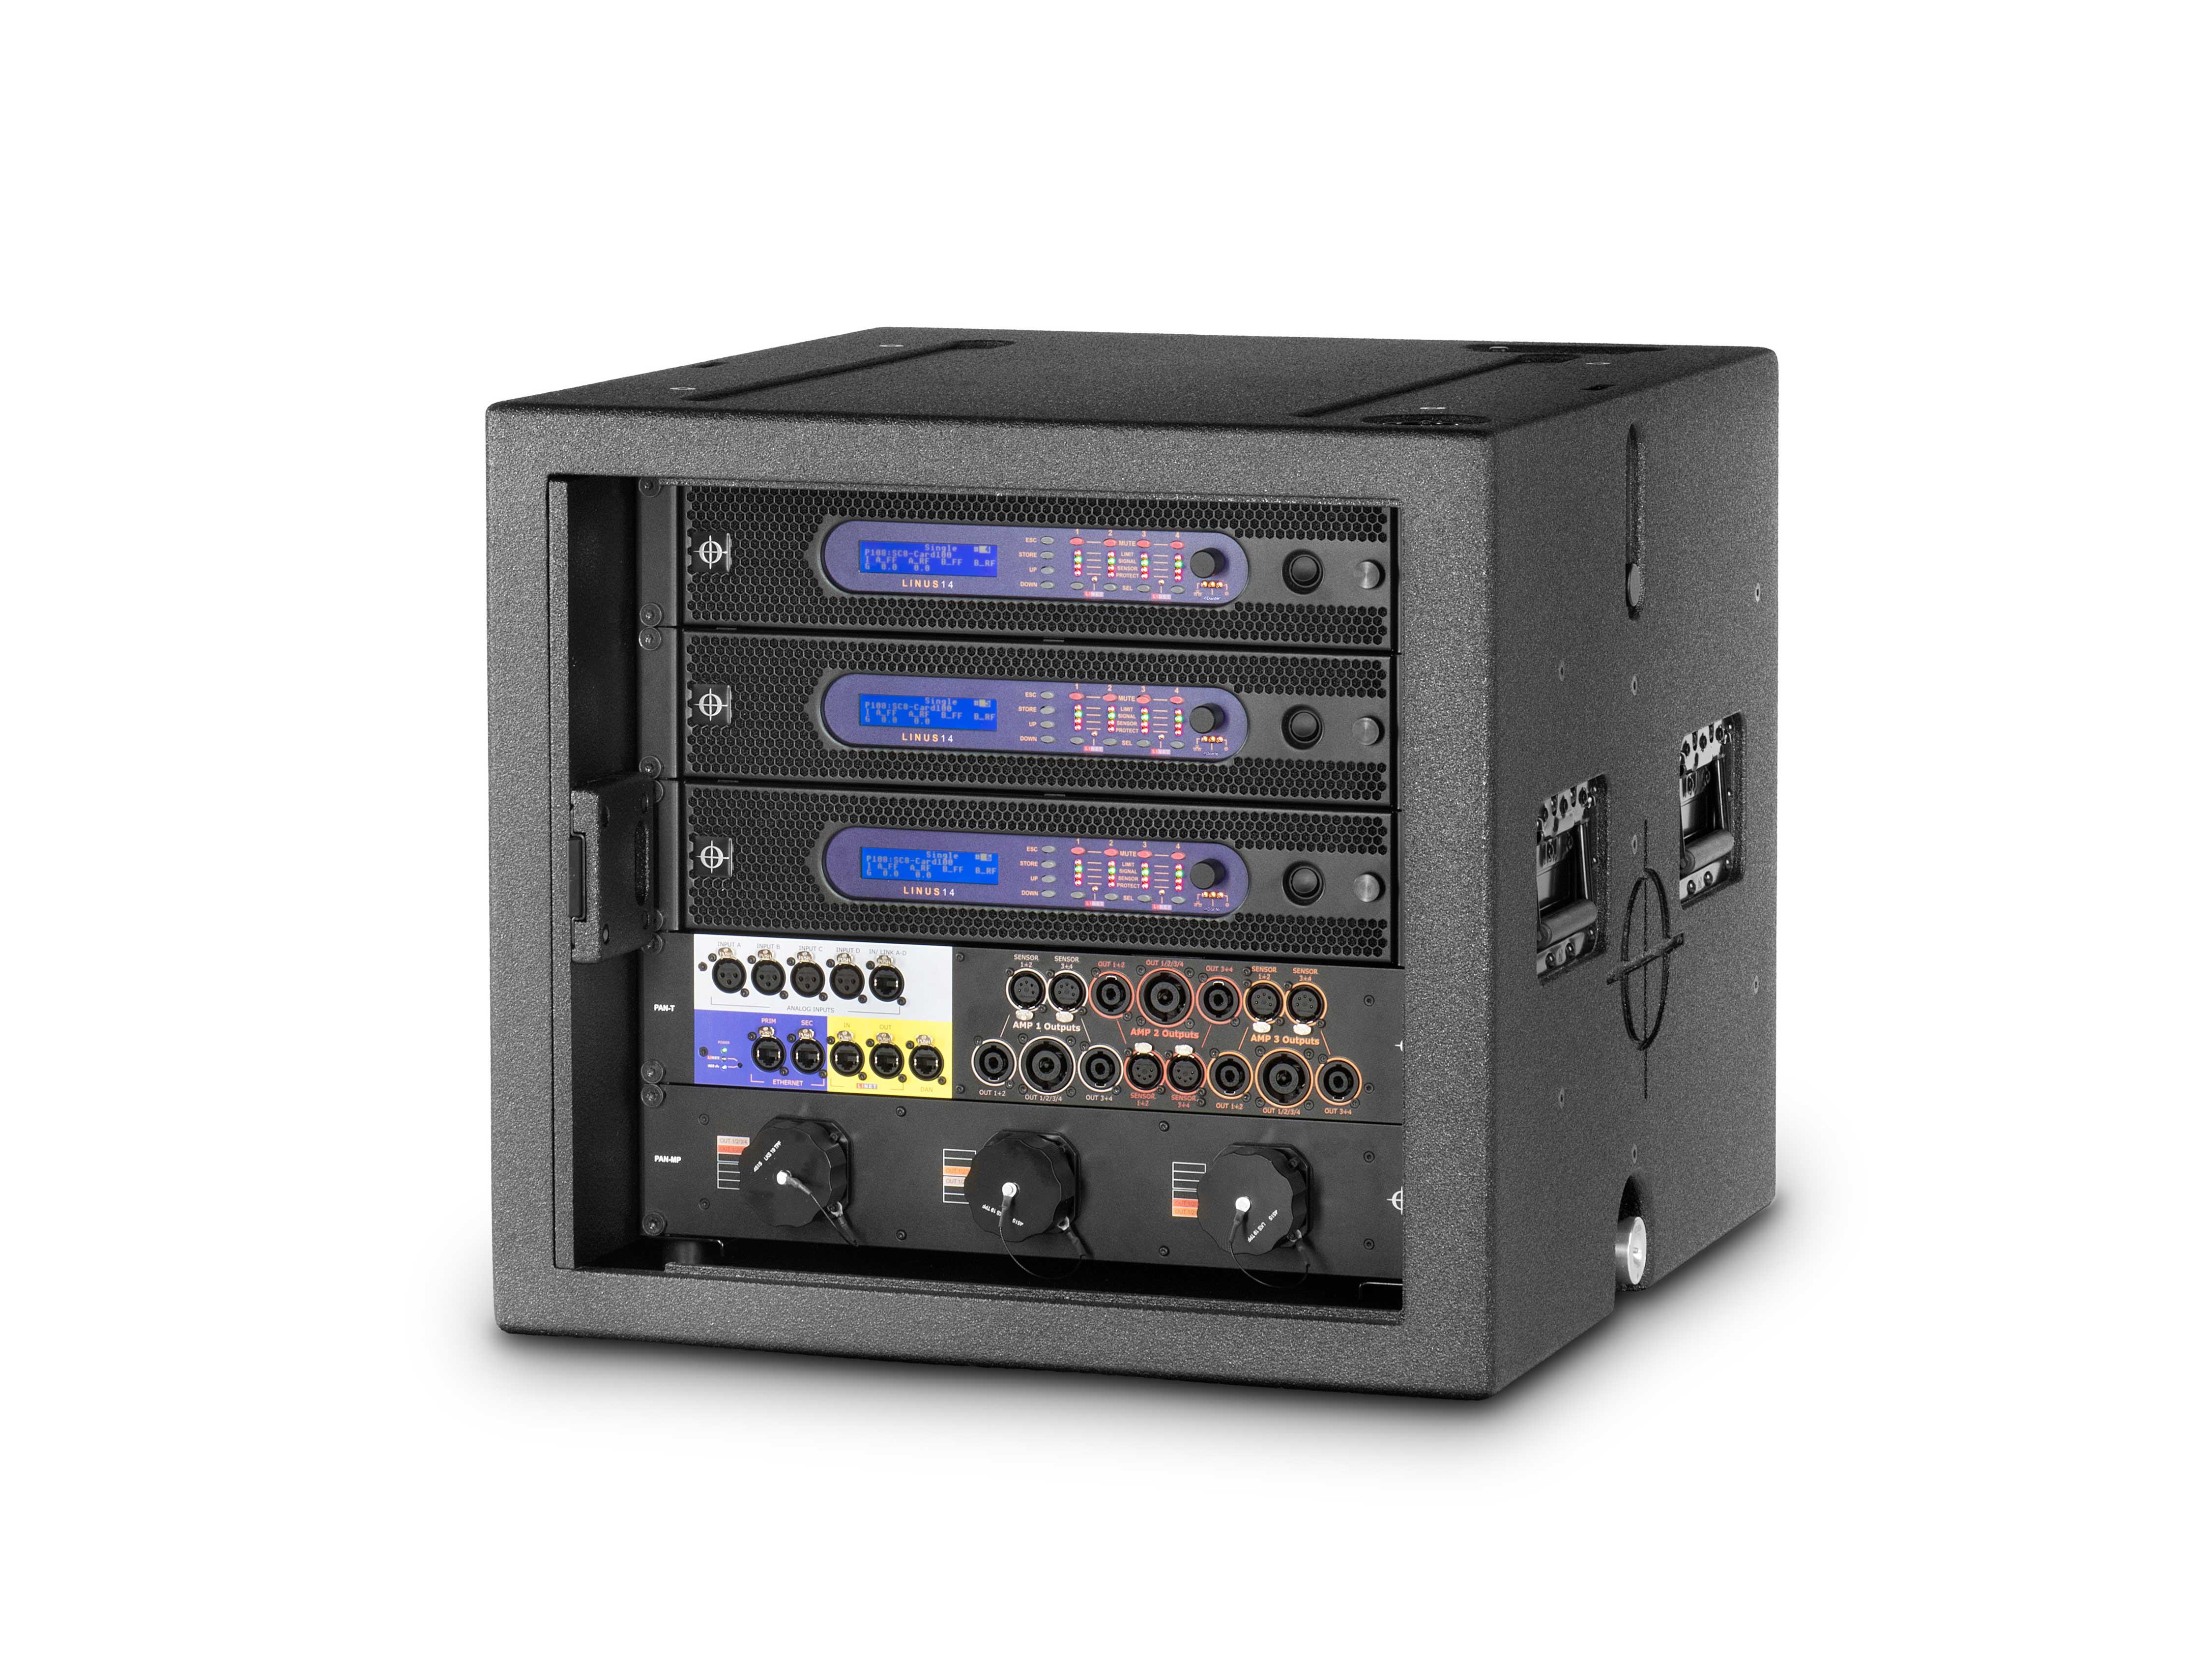 case black gliding odyssey with dj and platform all flight rack audio denon glide racks style